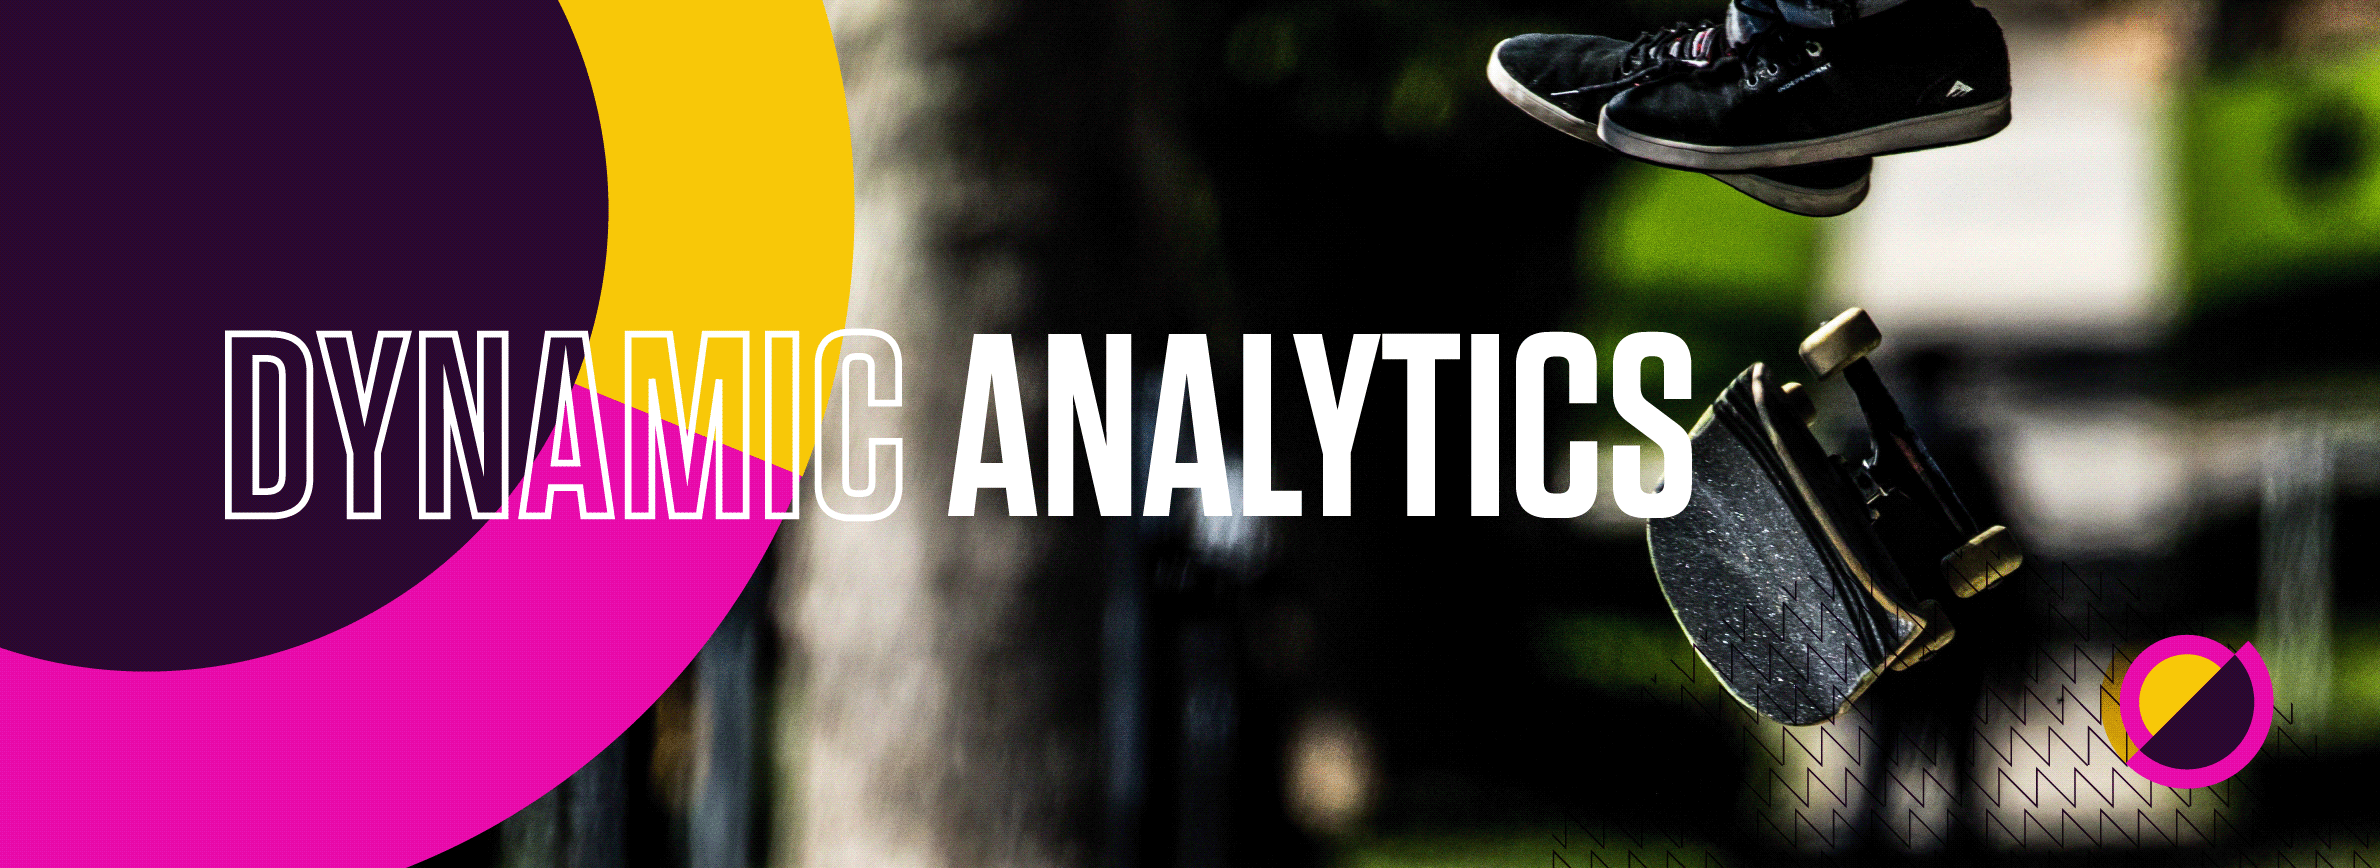 banner_dynamic_analytics@2x-8.png